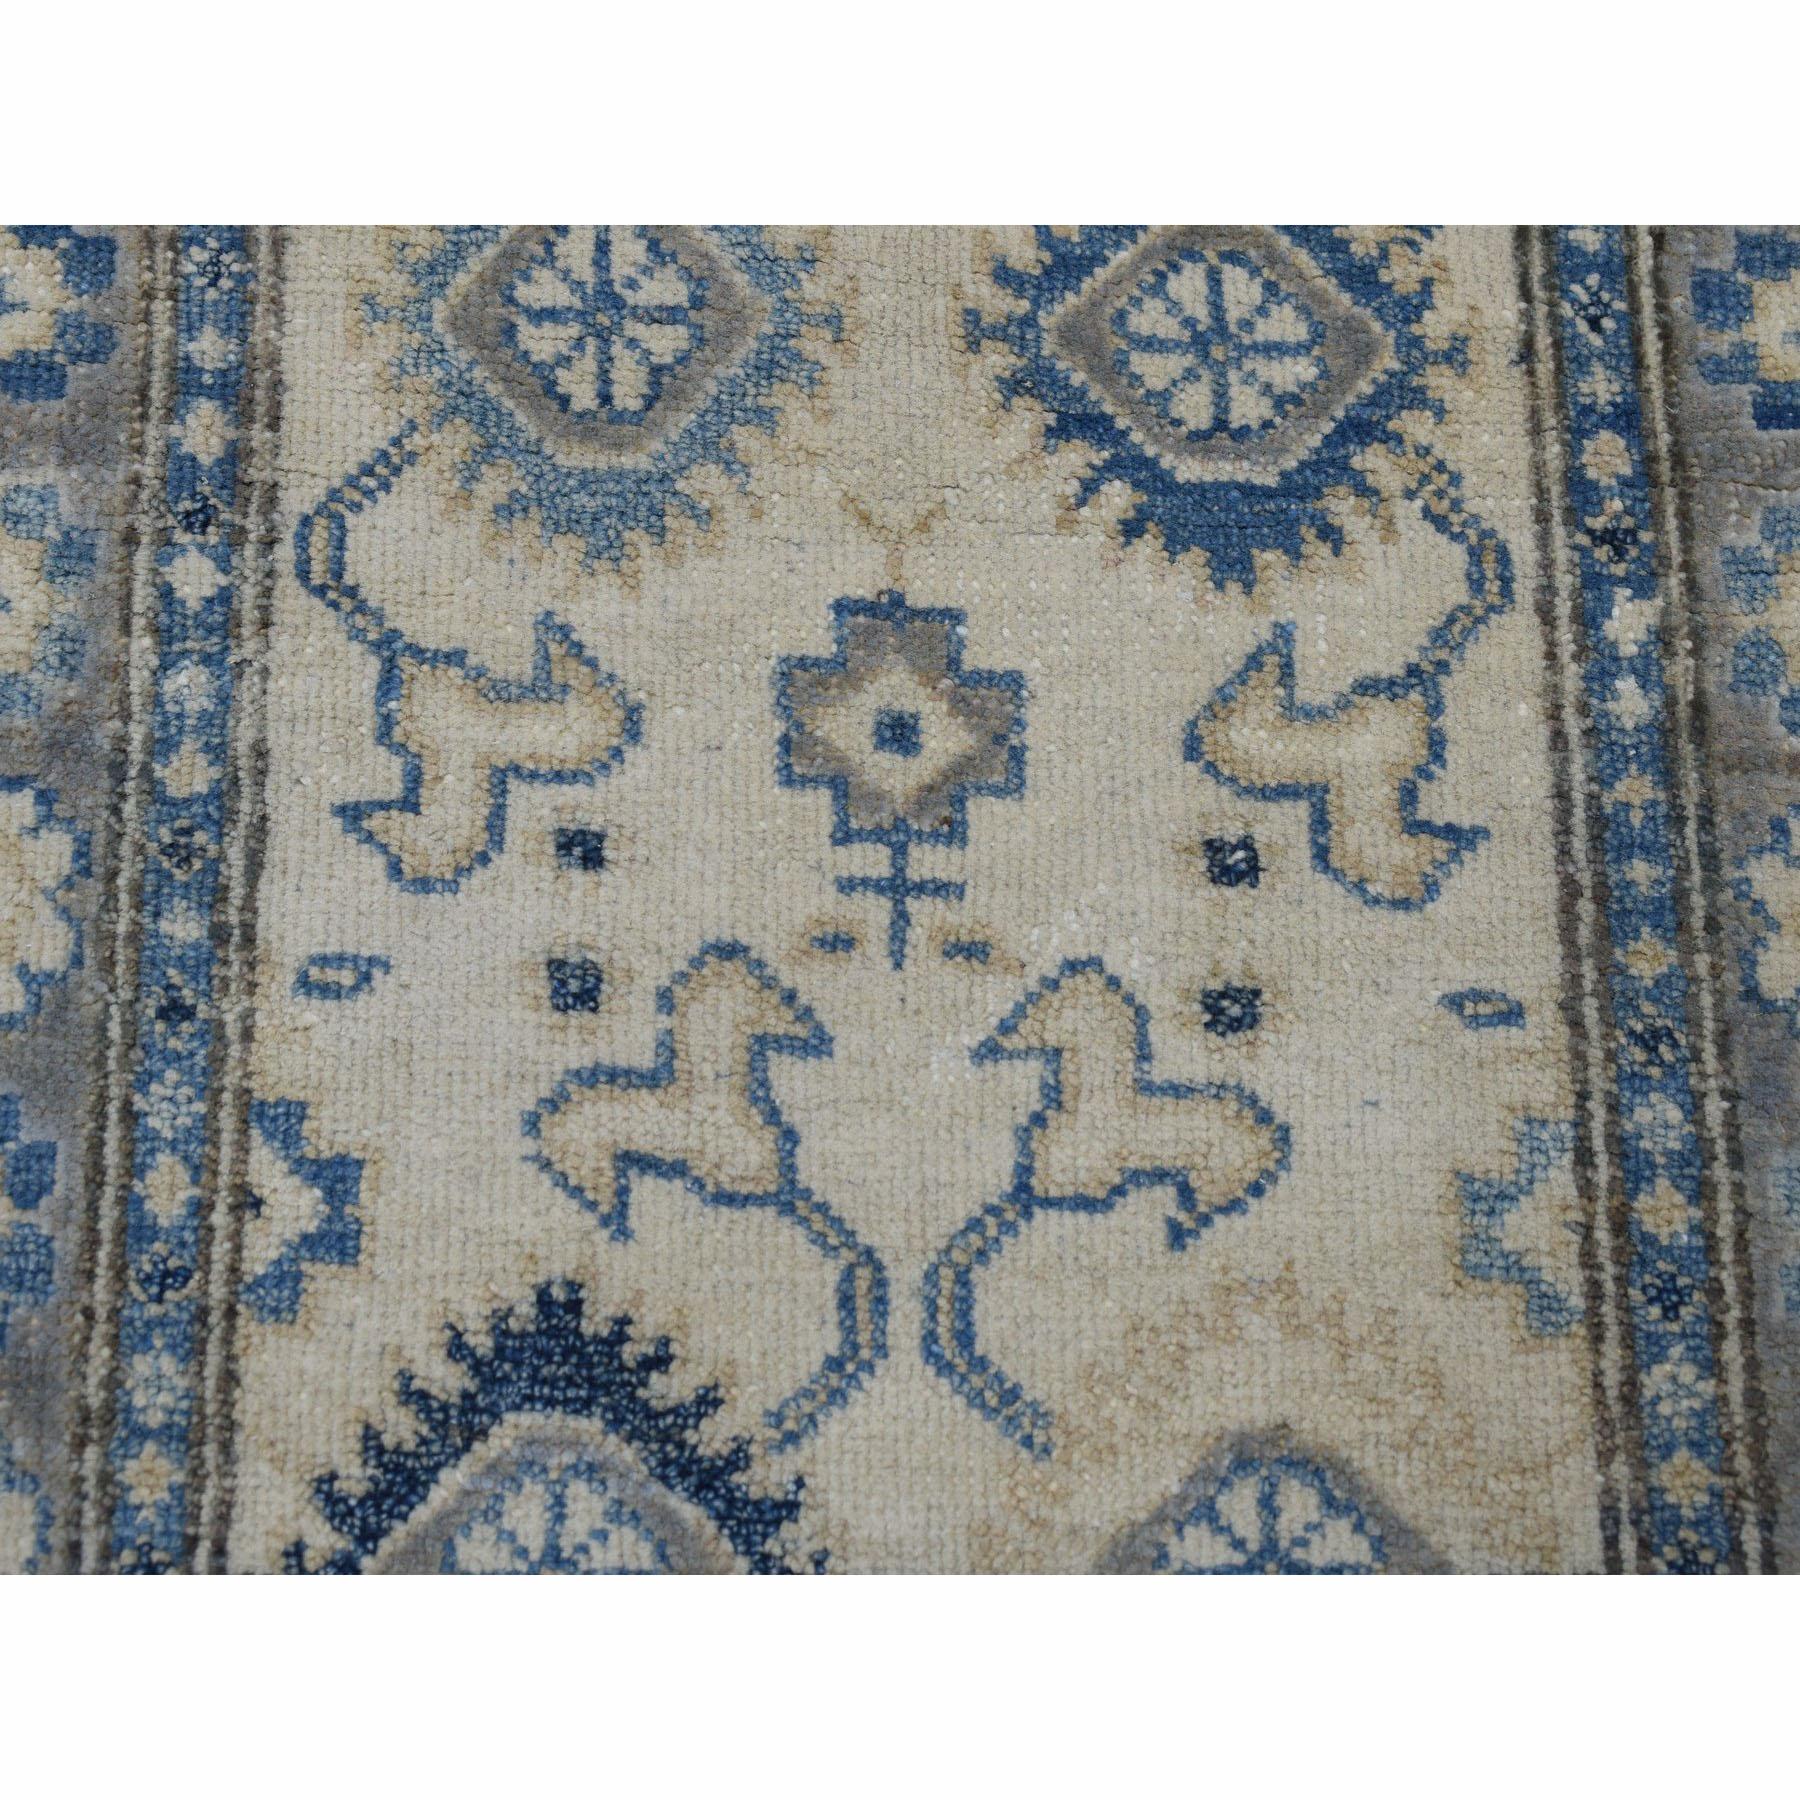 2-1 x3- Pure Wool Vintage Look Kazak Hand-Knotted Oriental Rug